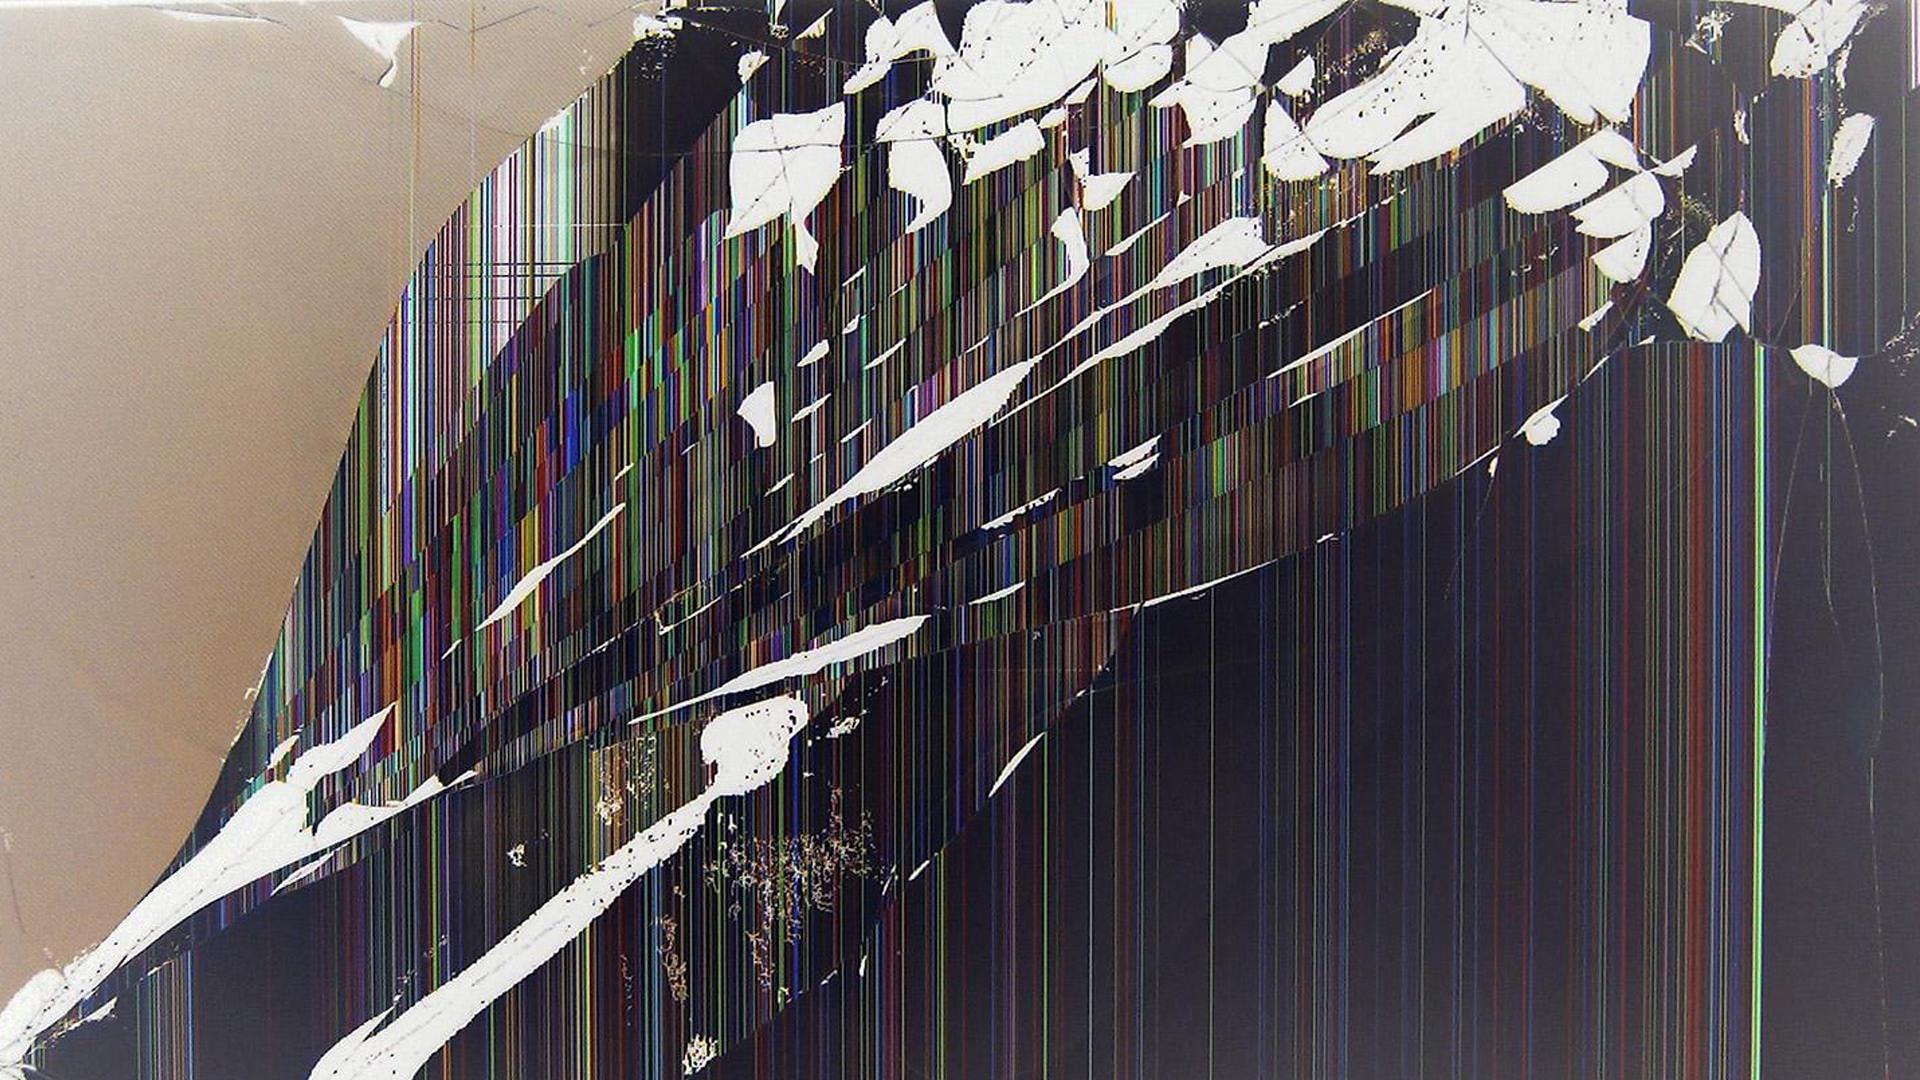 Creeper Broken Screen: Broken Screen Prank Wallpaper